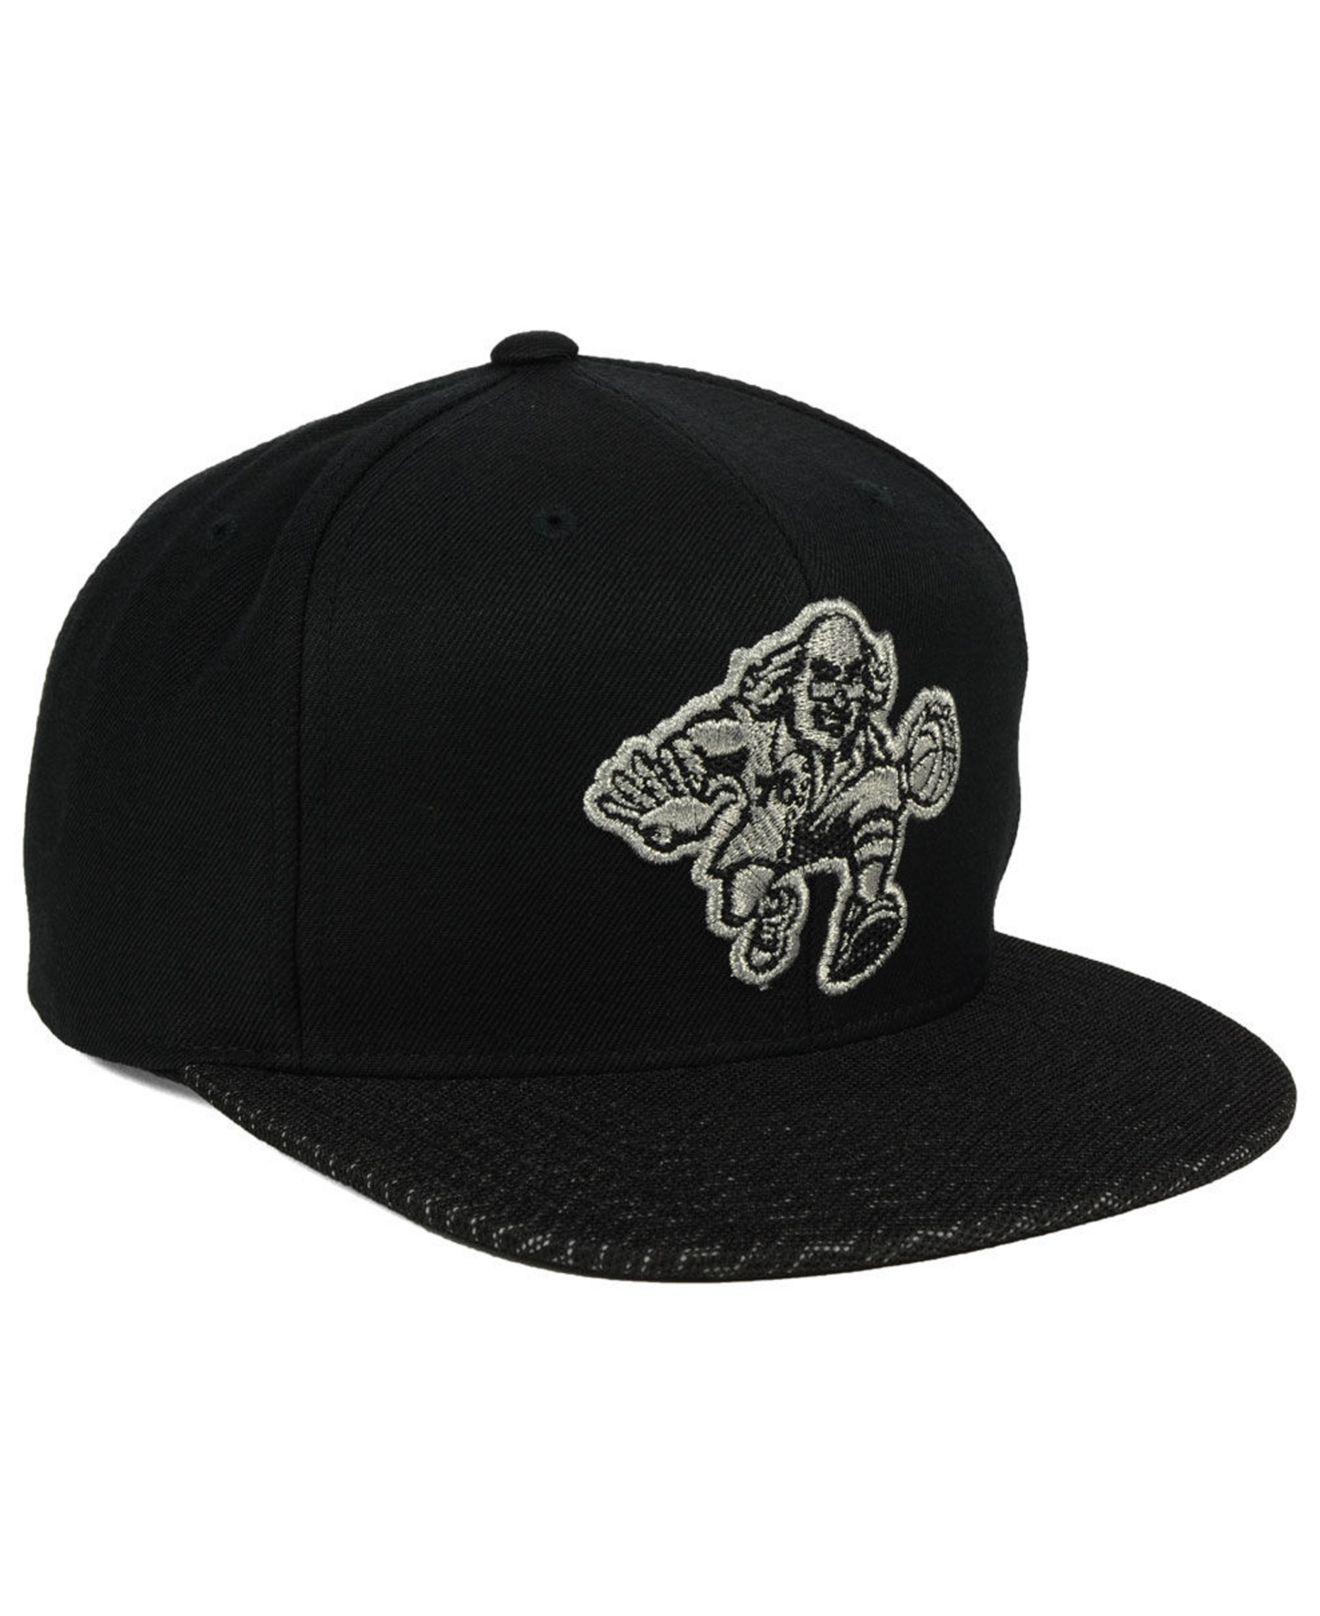 54292502f46 Lyst - Mitchell   Ness Philadelphia 76ers 3m Mesh Snapback Cap in ...